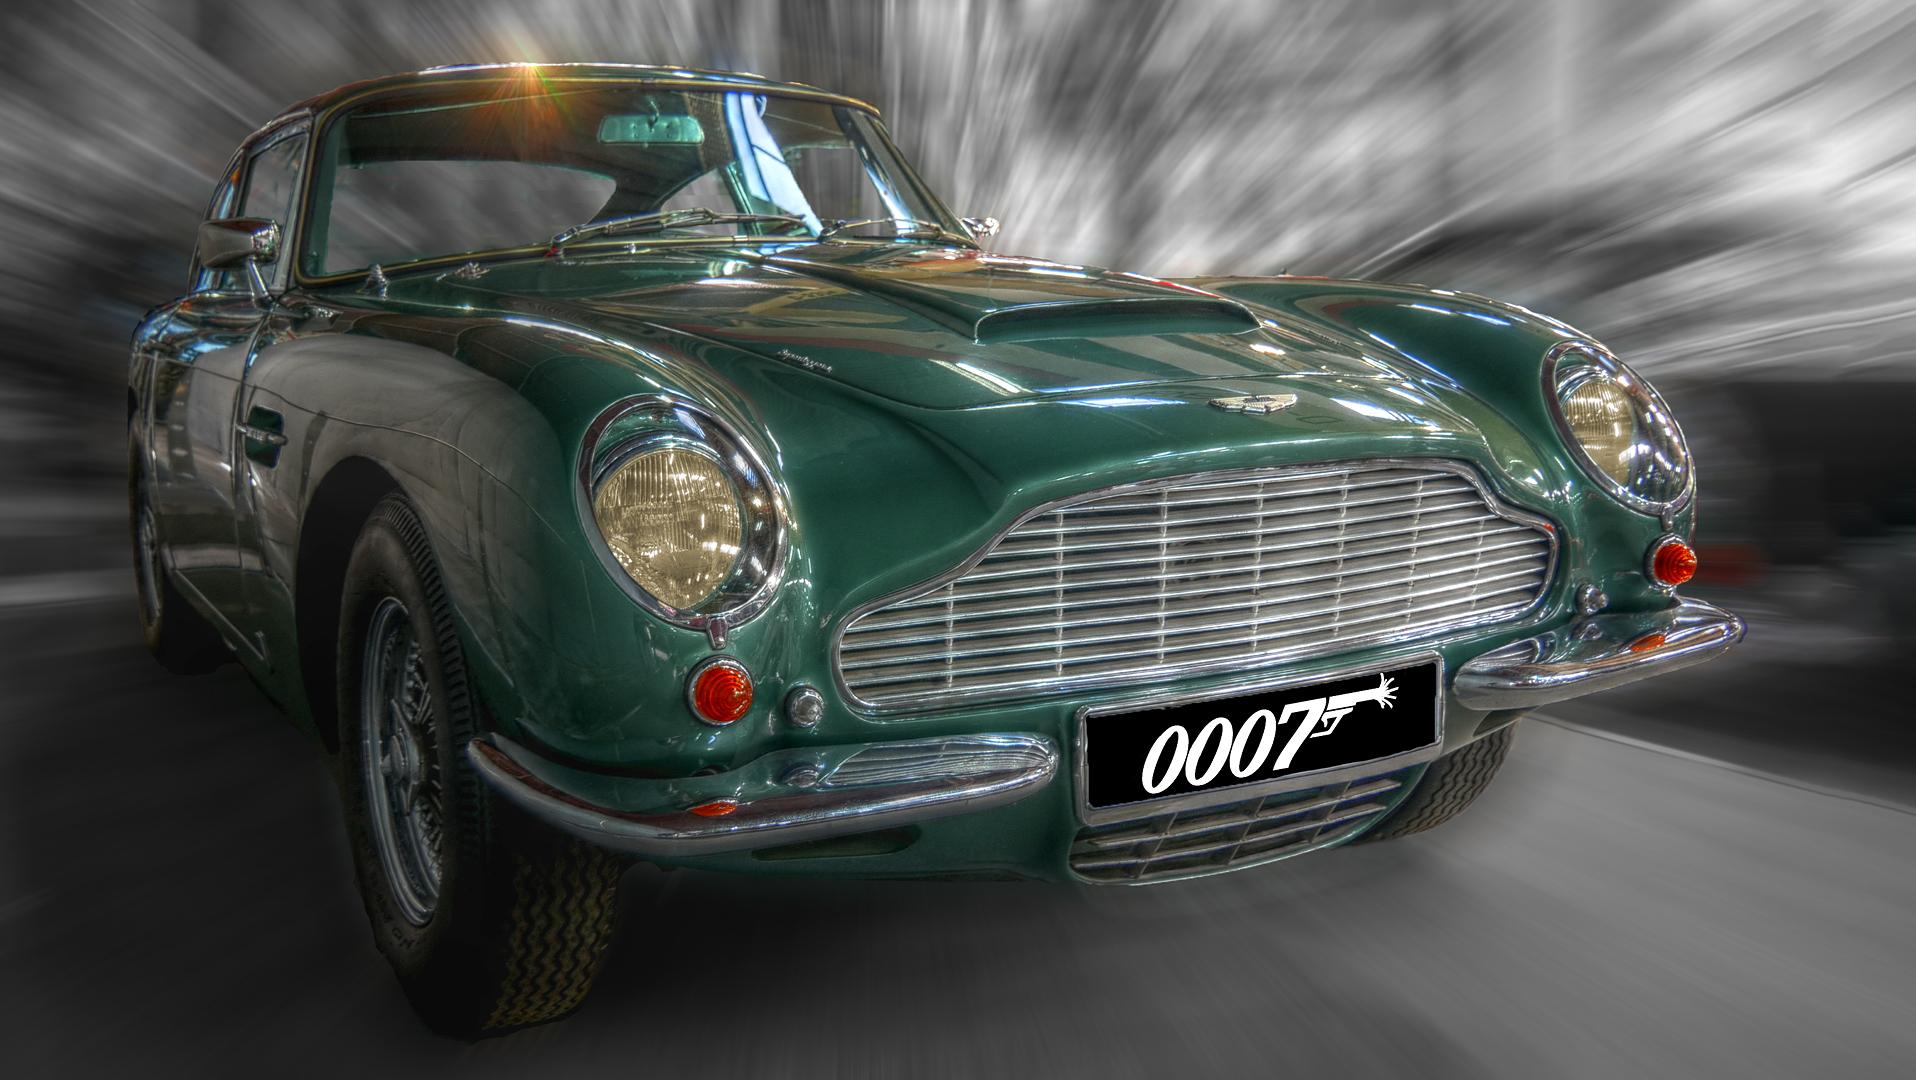 Aston Martin Db 6 Vantage Foto Bild Digiart Colorkey Oldtimer Bilder Auf Fotocommunity